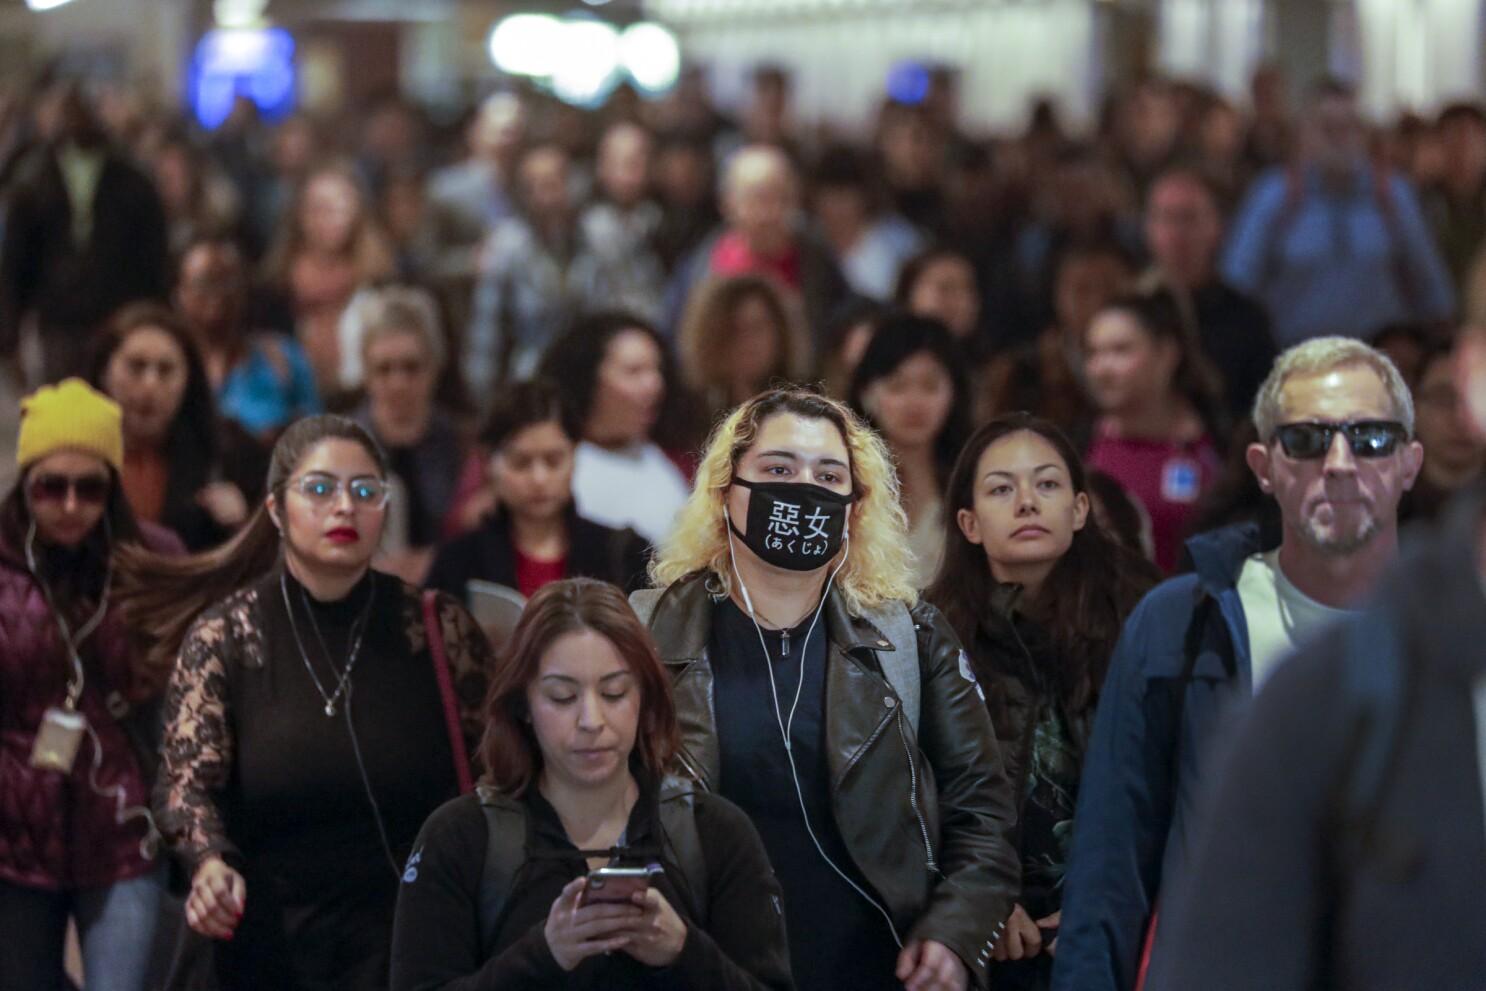 Coronavirus Memes Fill Social Media Making Young People Anxious Los Angeles Times